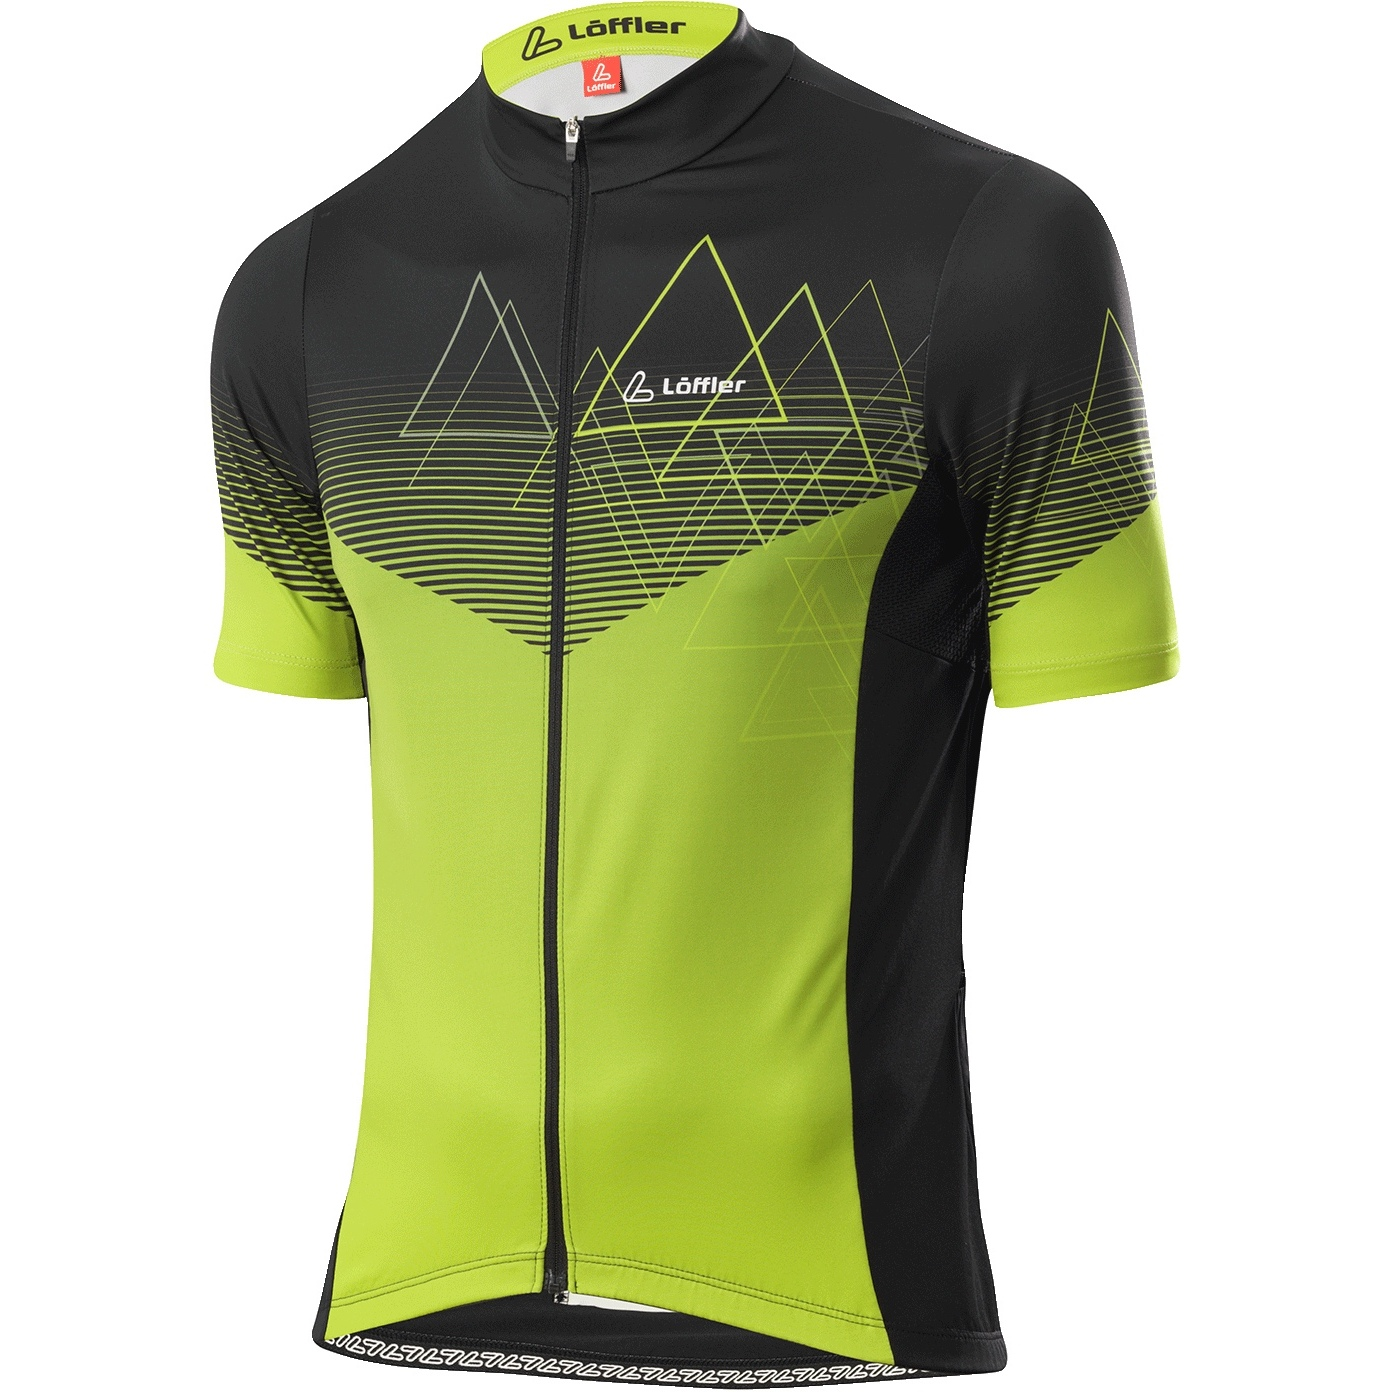 Löffler Bike Trikot FZ Peaks 24603 - light green 330